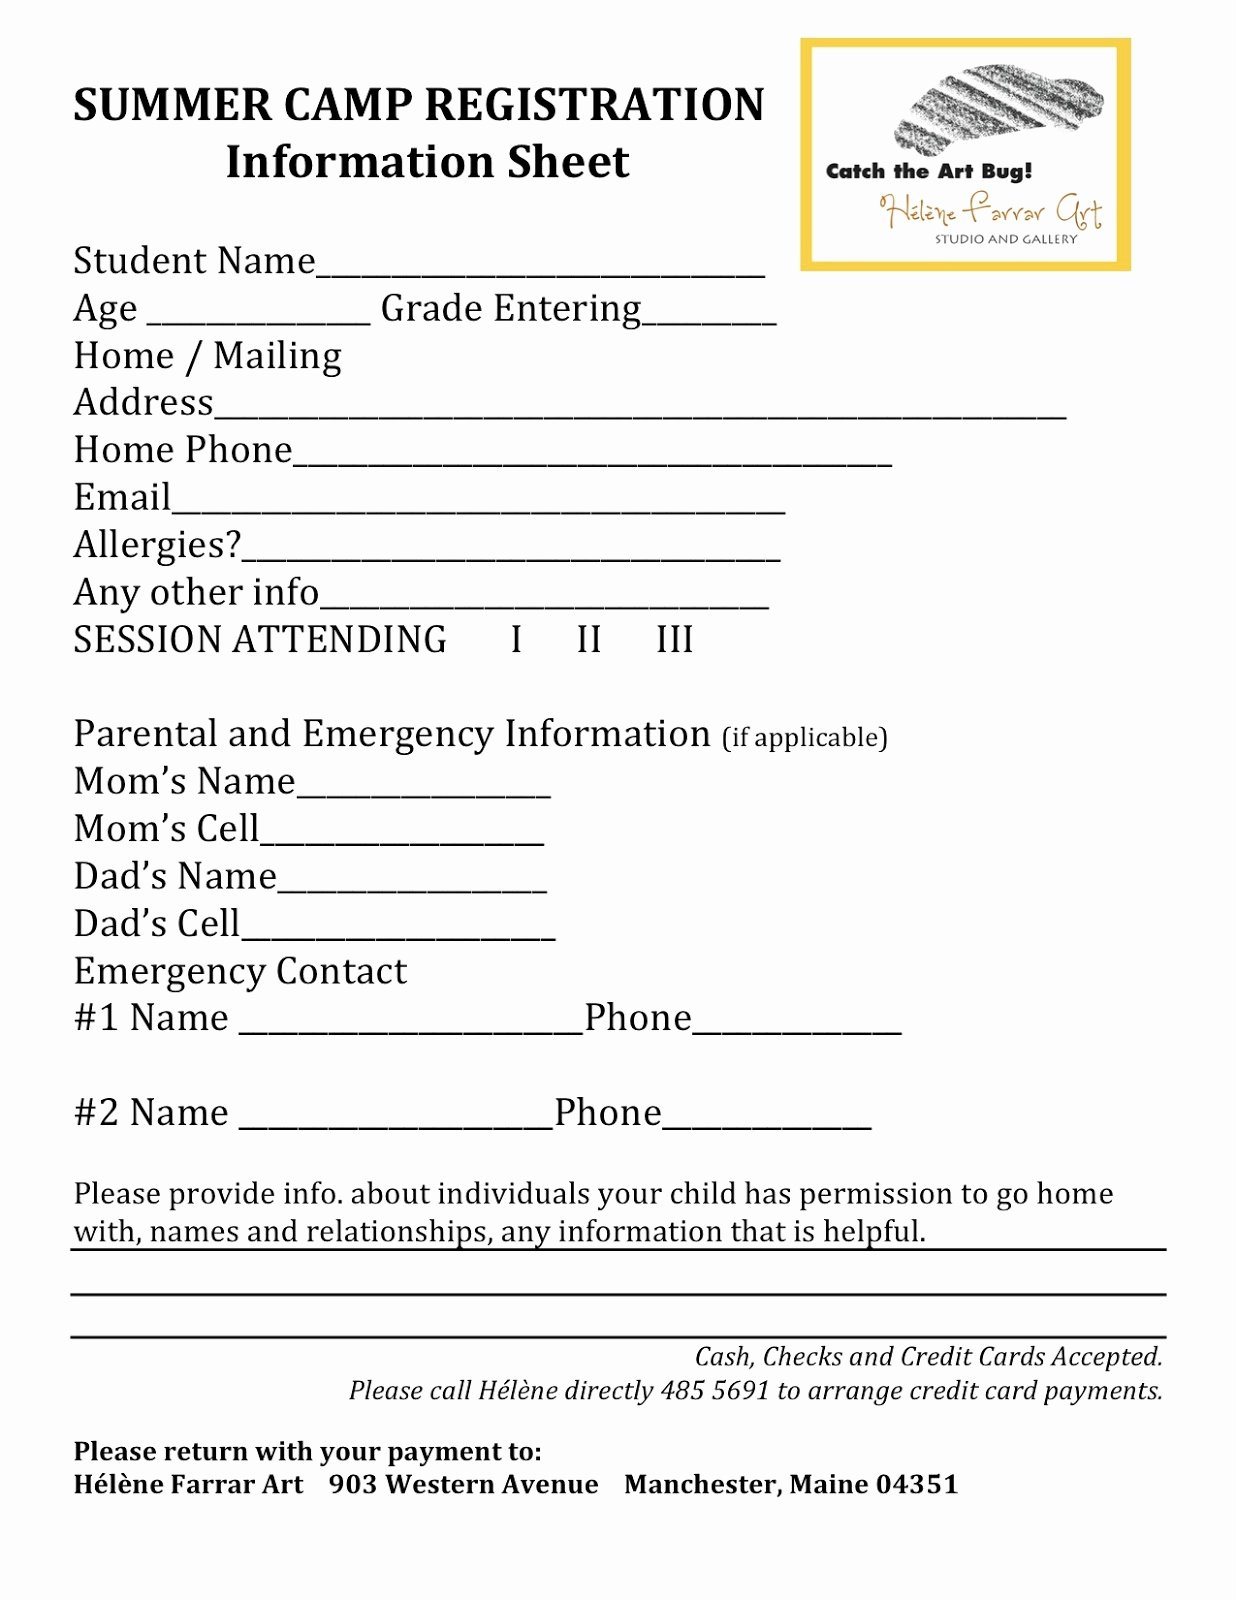 Free Summer Camp Registration form Template Fresh Registration form Template